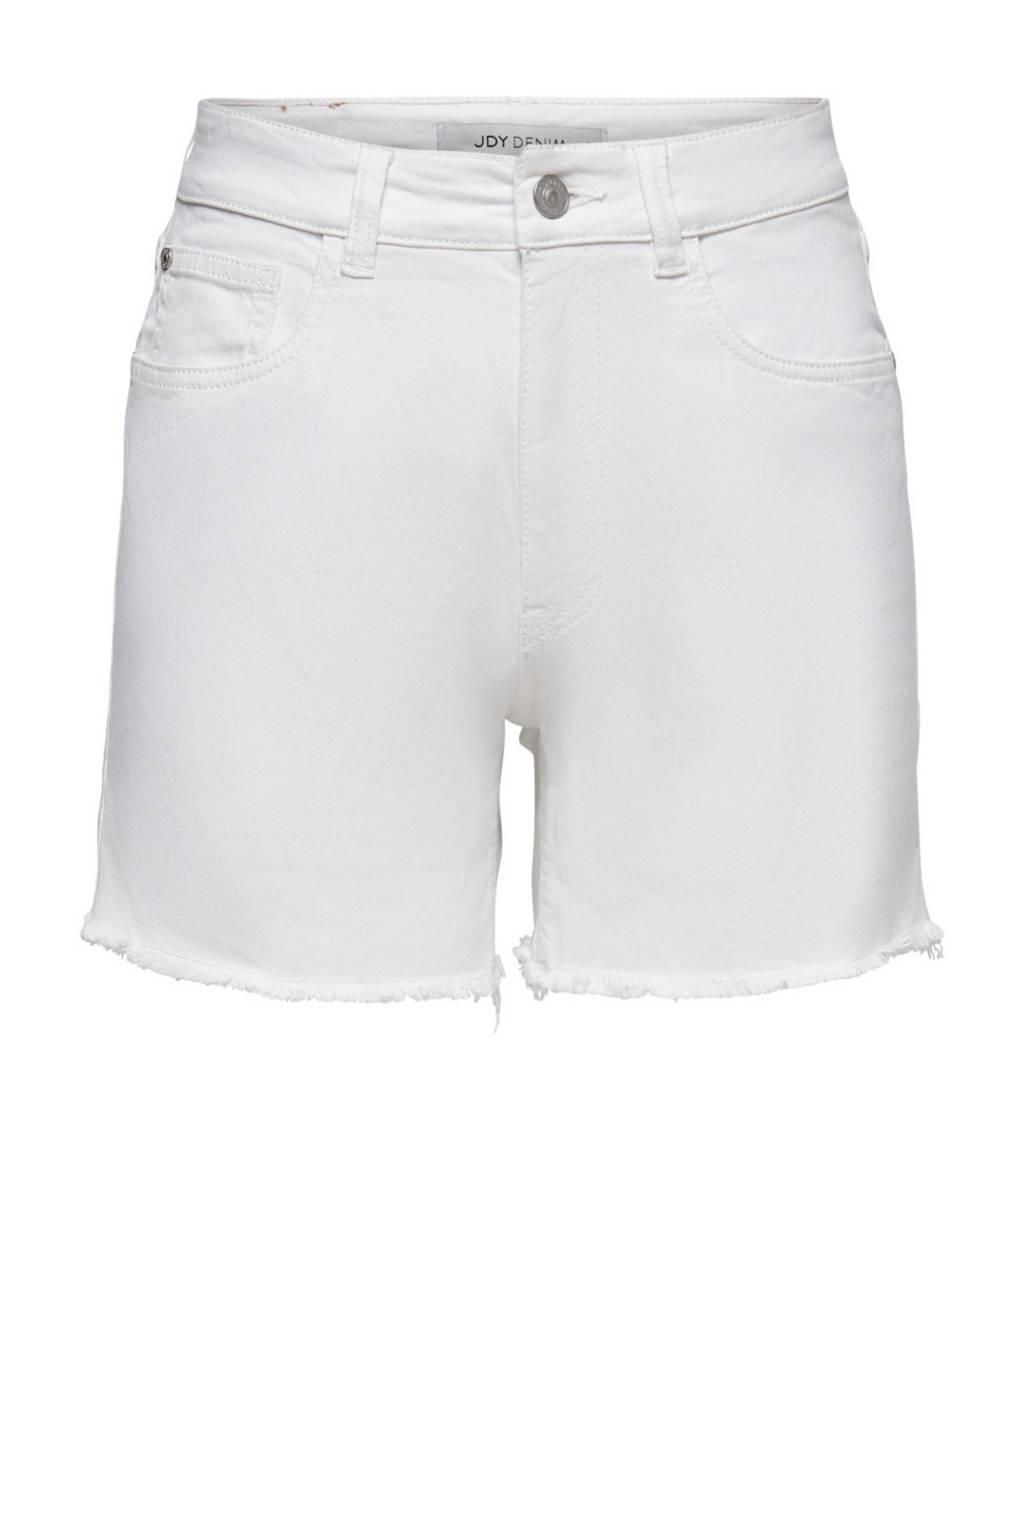 JDY high waist jeans short JDYOLIVIA wit, Wit